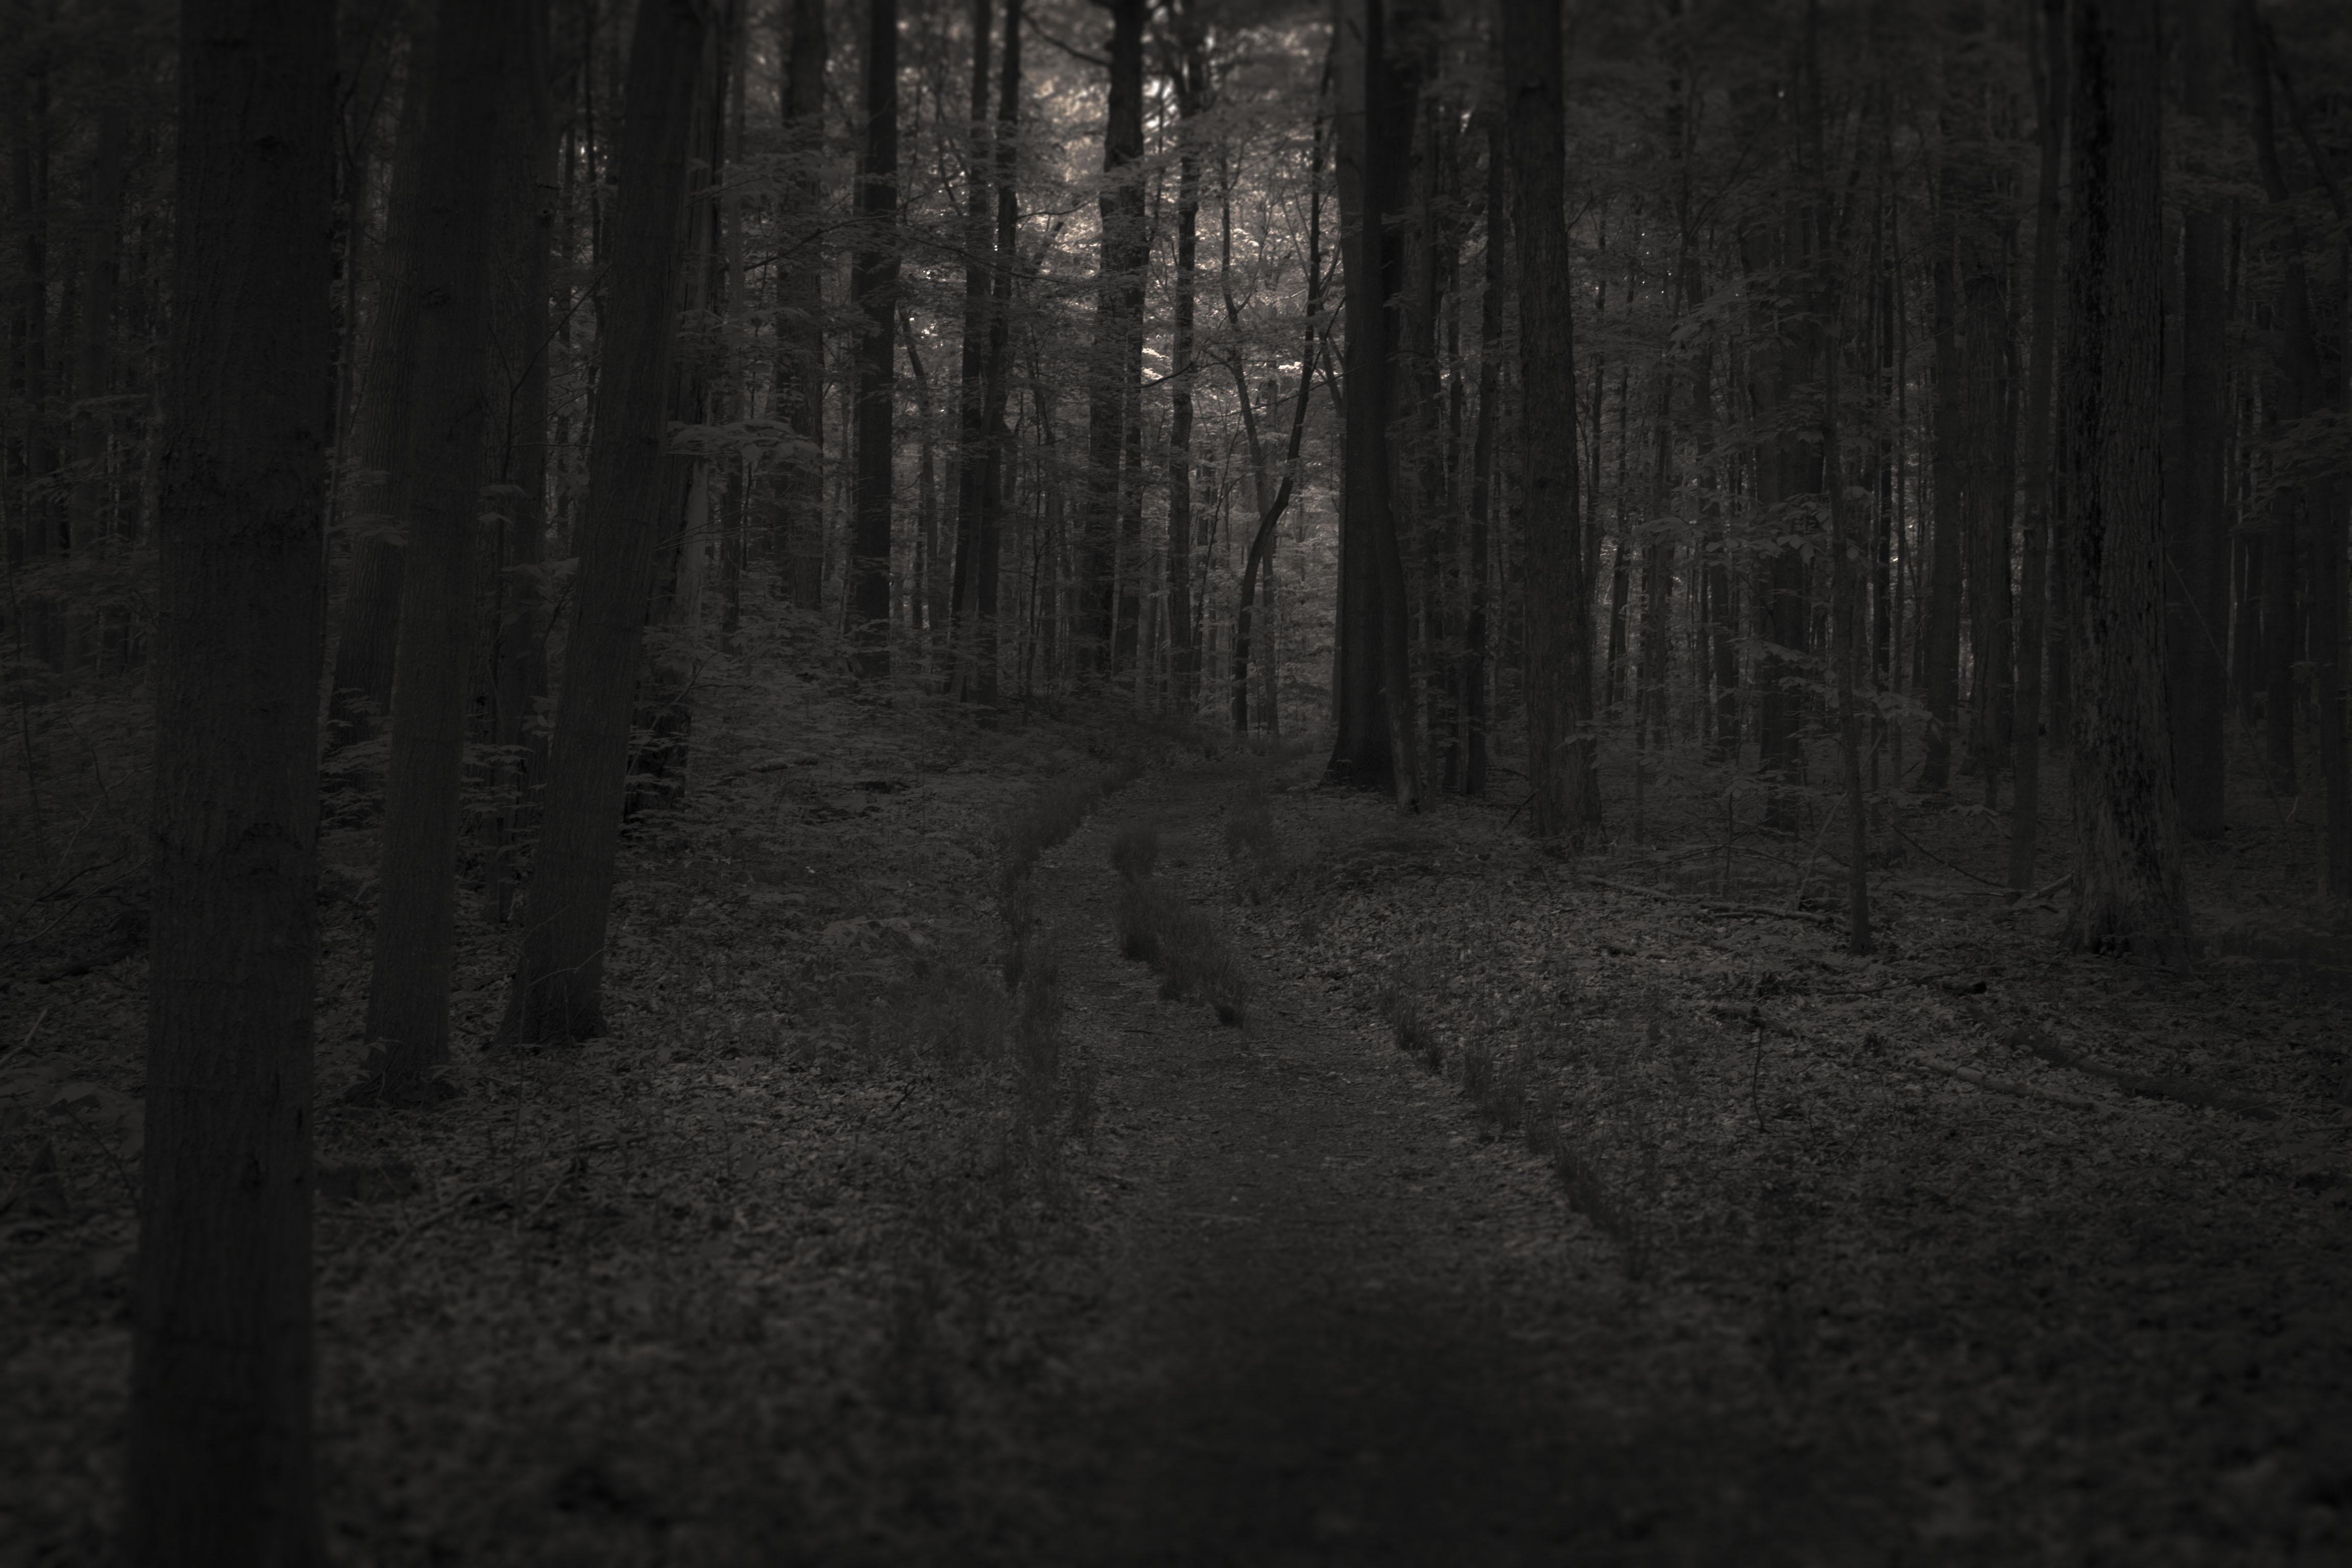 black-forest-path.jpg